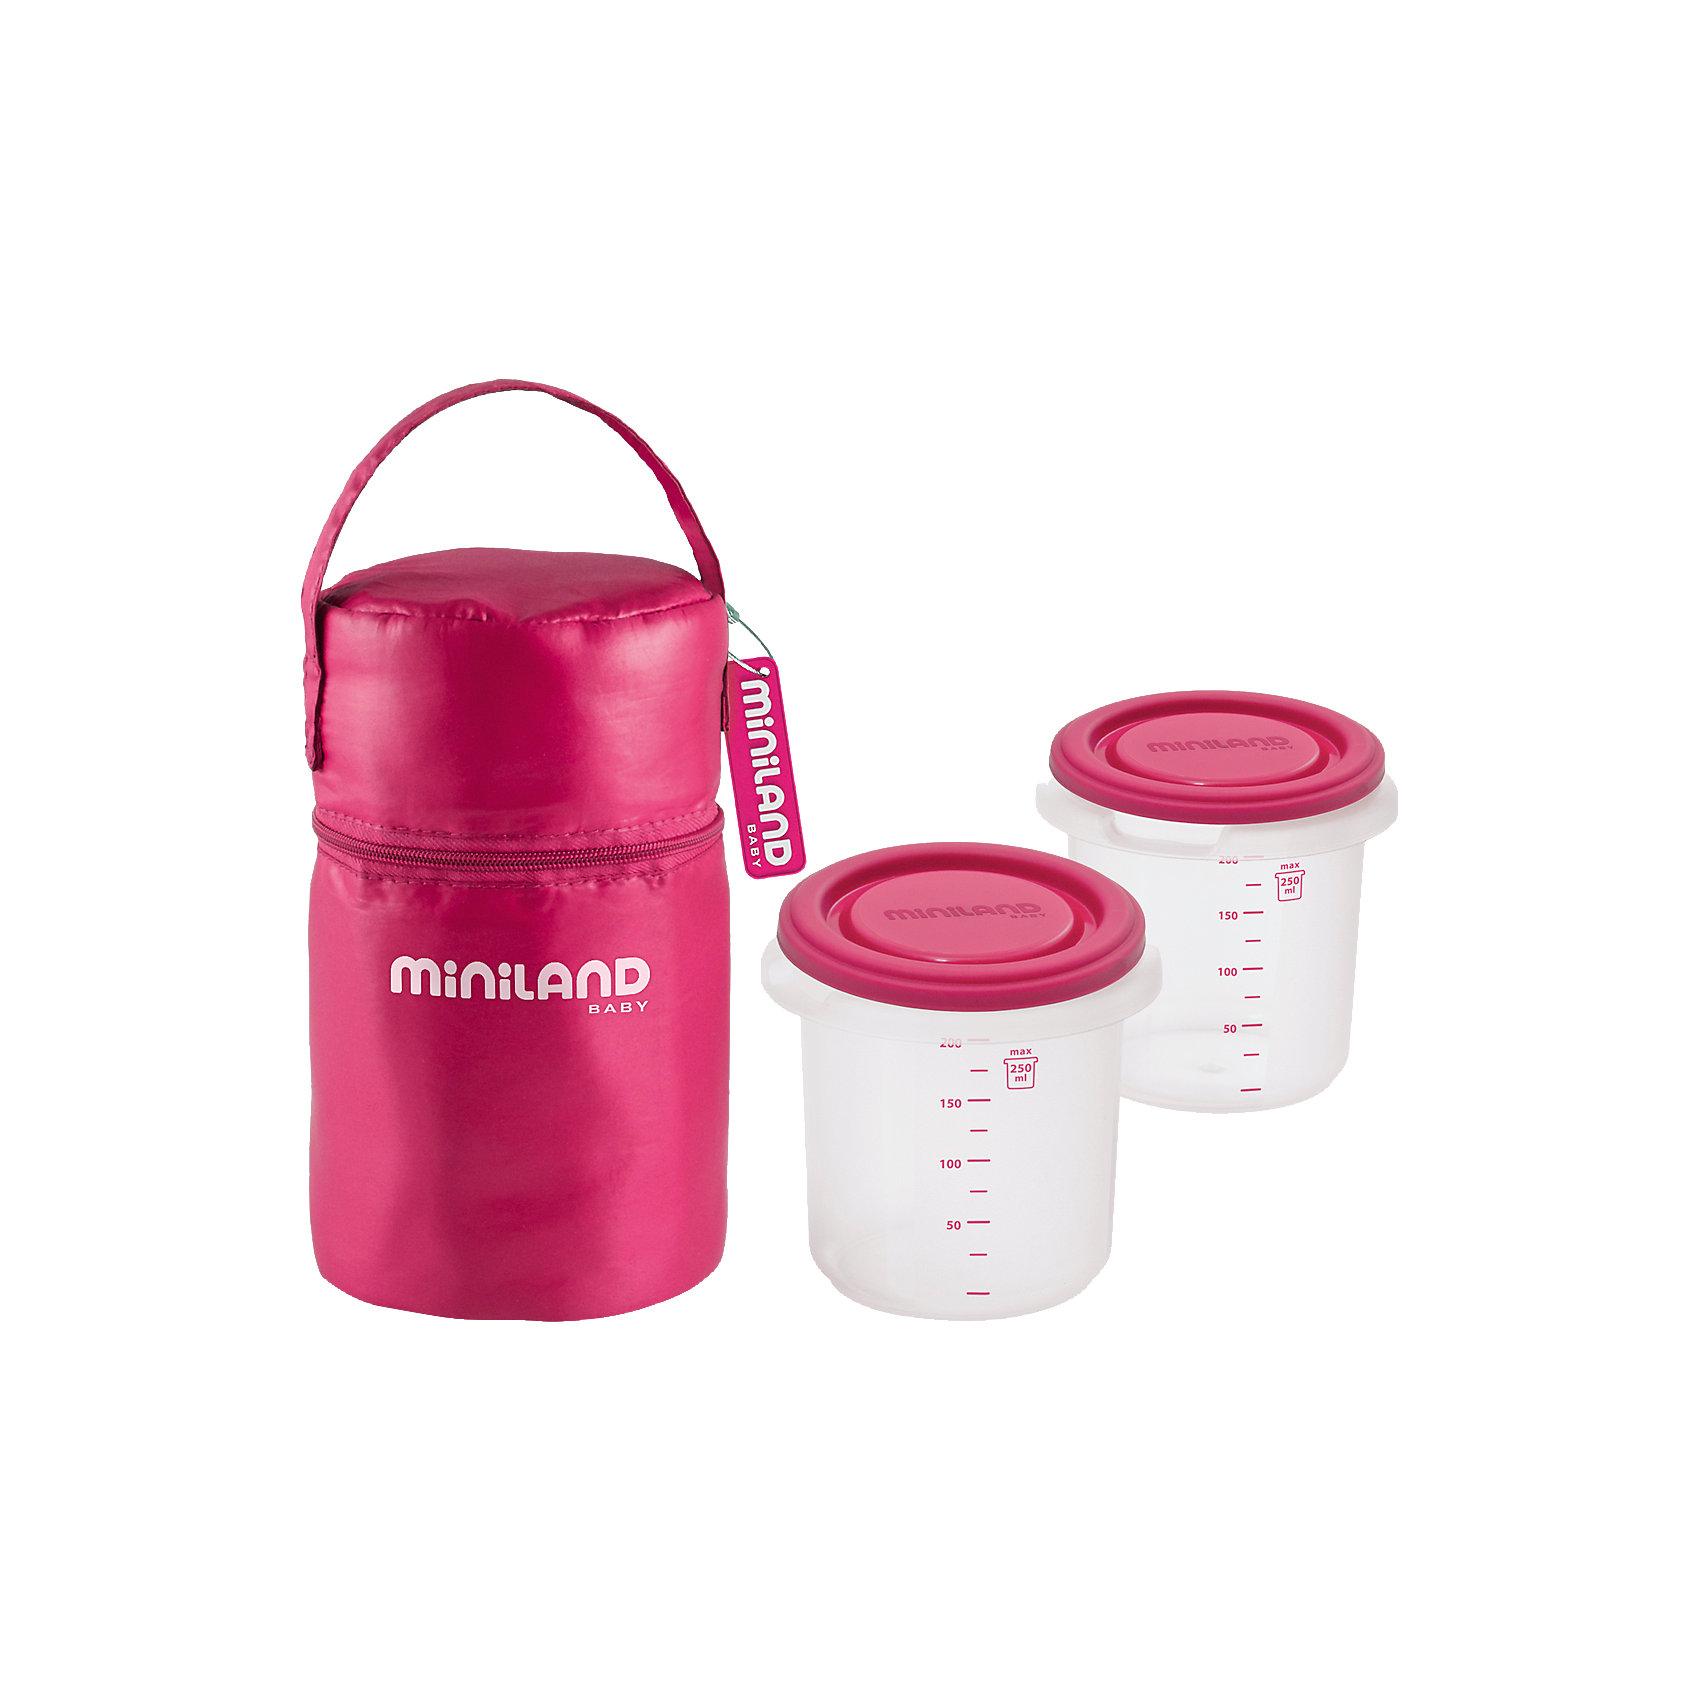 Miniland Термосумка с 2-мя мерными стаканчиками, HERMISIZED, термосумки miniland термосумка с 2 мерными стаканчиками pack 2 go hermifresh